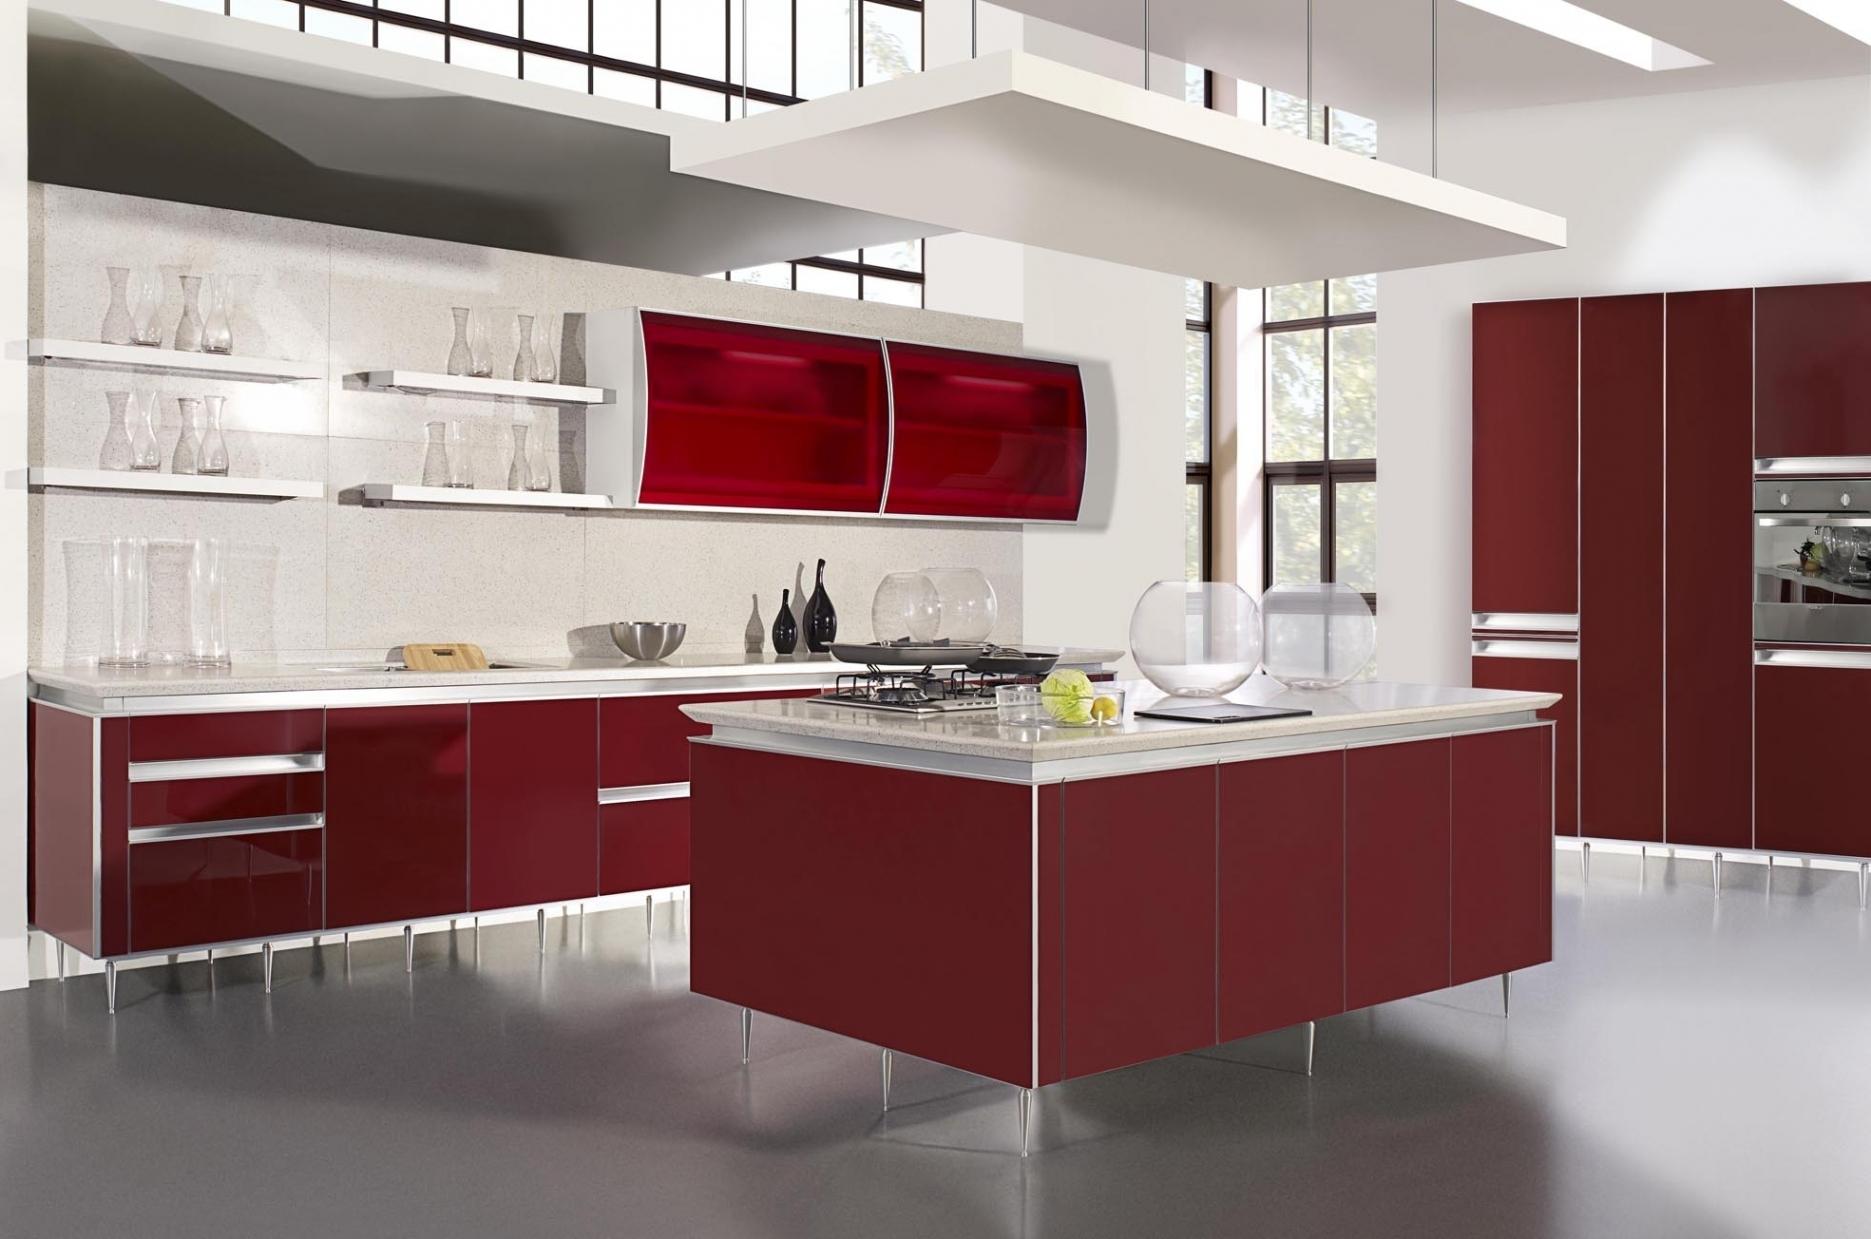 Black White And Red Kitchen Design Ideas 6572 Baytownkitchen With Regard To Black White And Red Kitchen Design Black White And Red Kitchen Design Ideas 6572 Baytownkitchen With Regard To